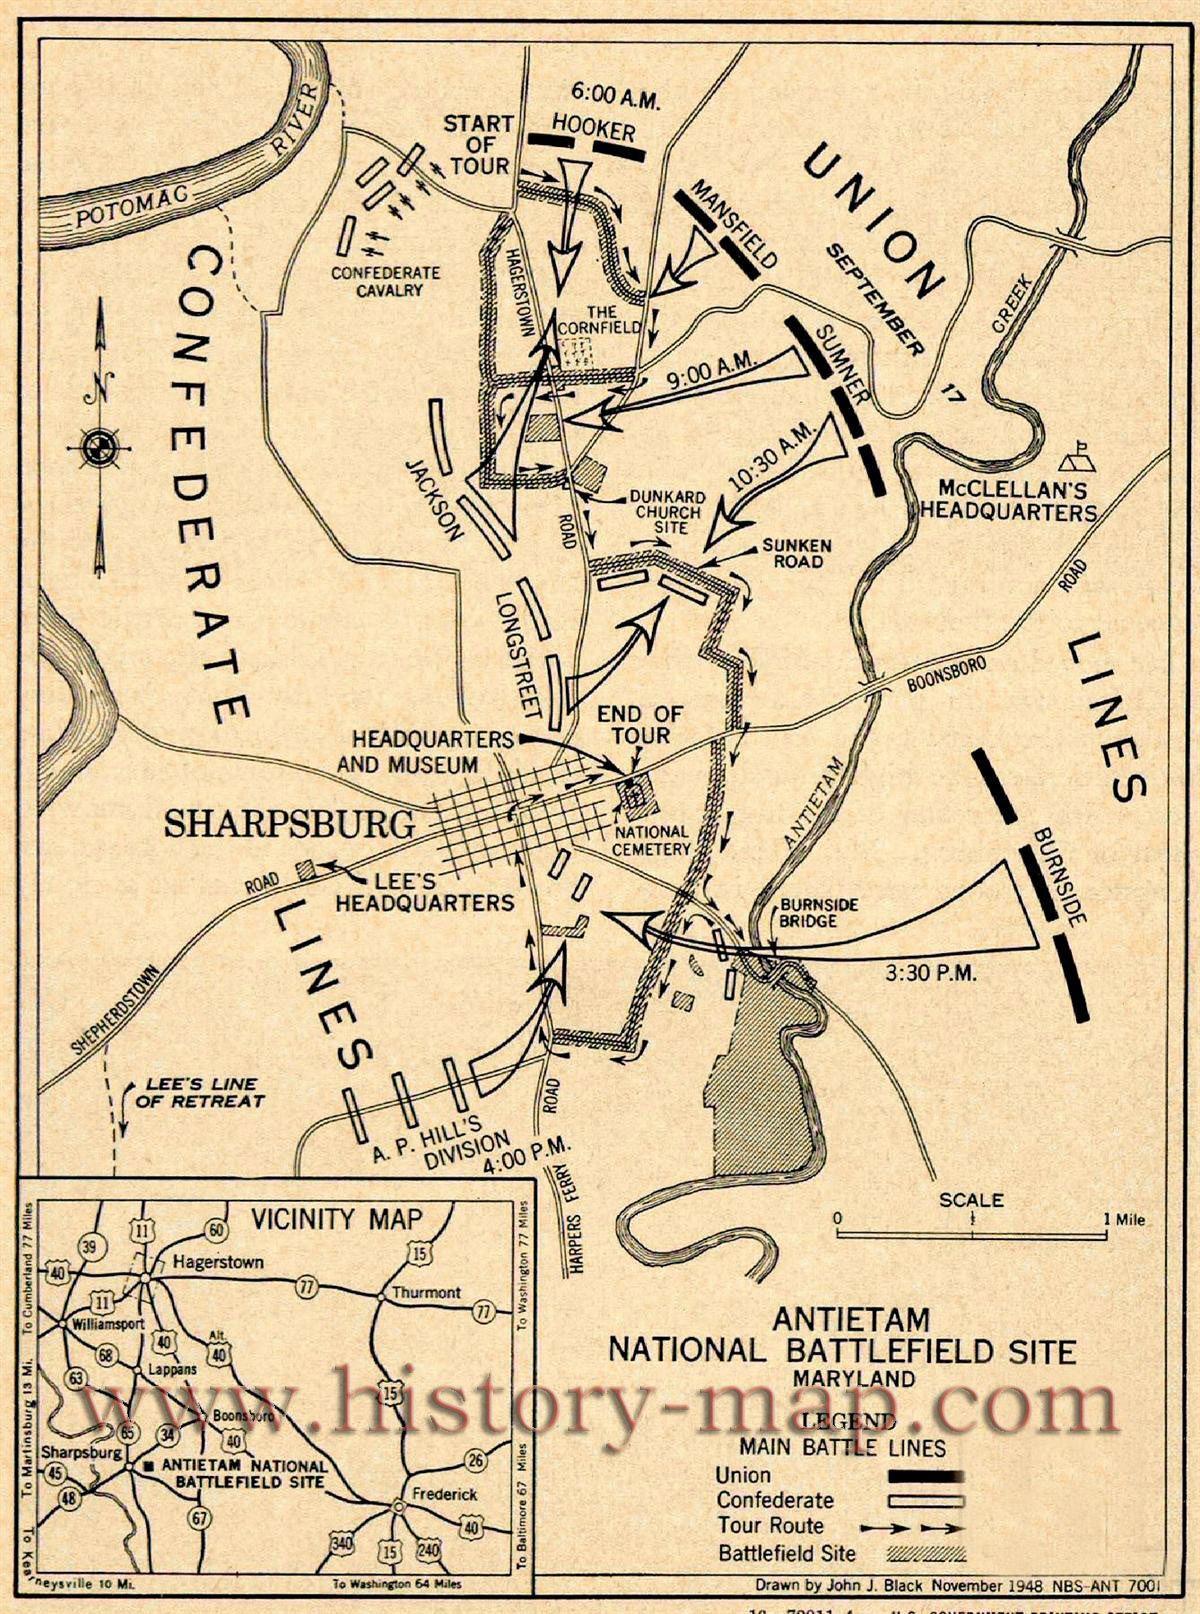 Antietam National Battlefield Site